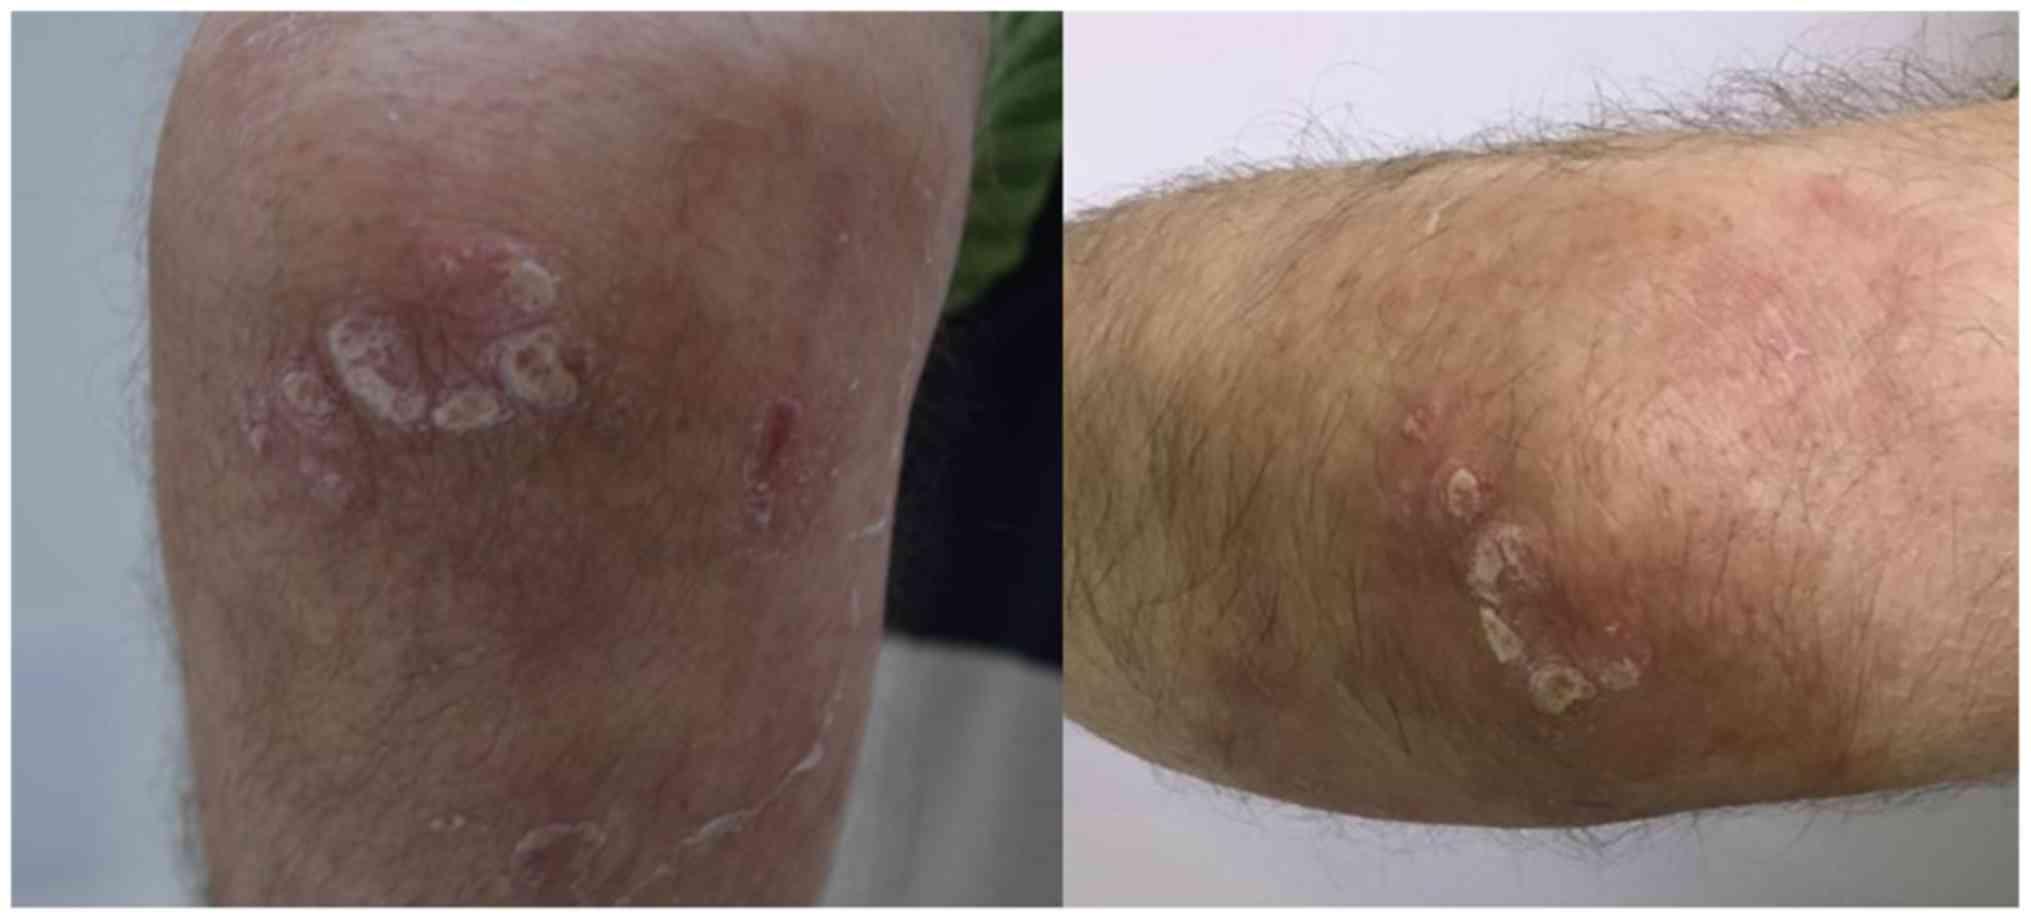 Laser dermatology | vrindex.hu